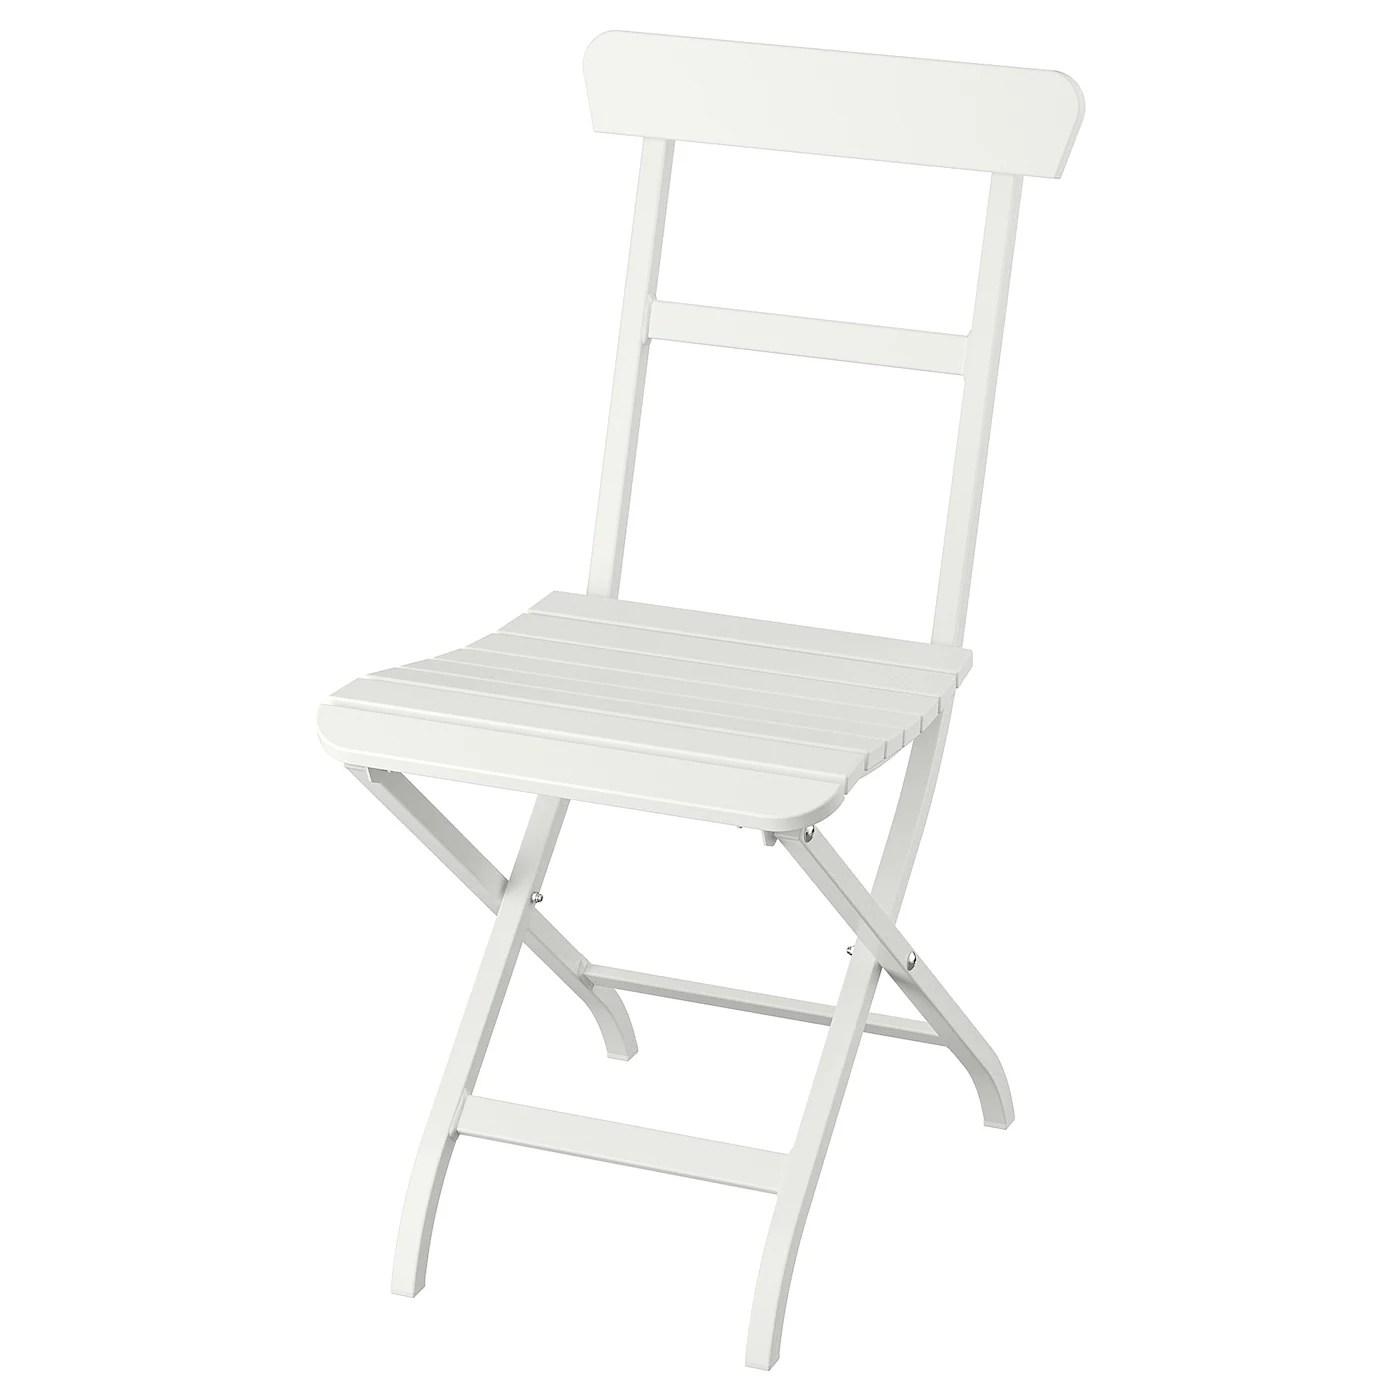 Malaro Chaise Blanc Pliable Blanc Ikea Ikea